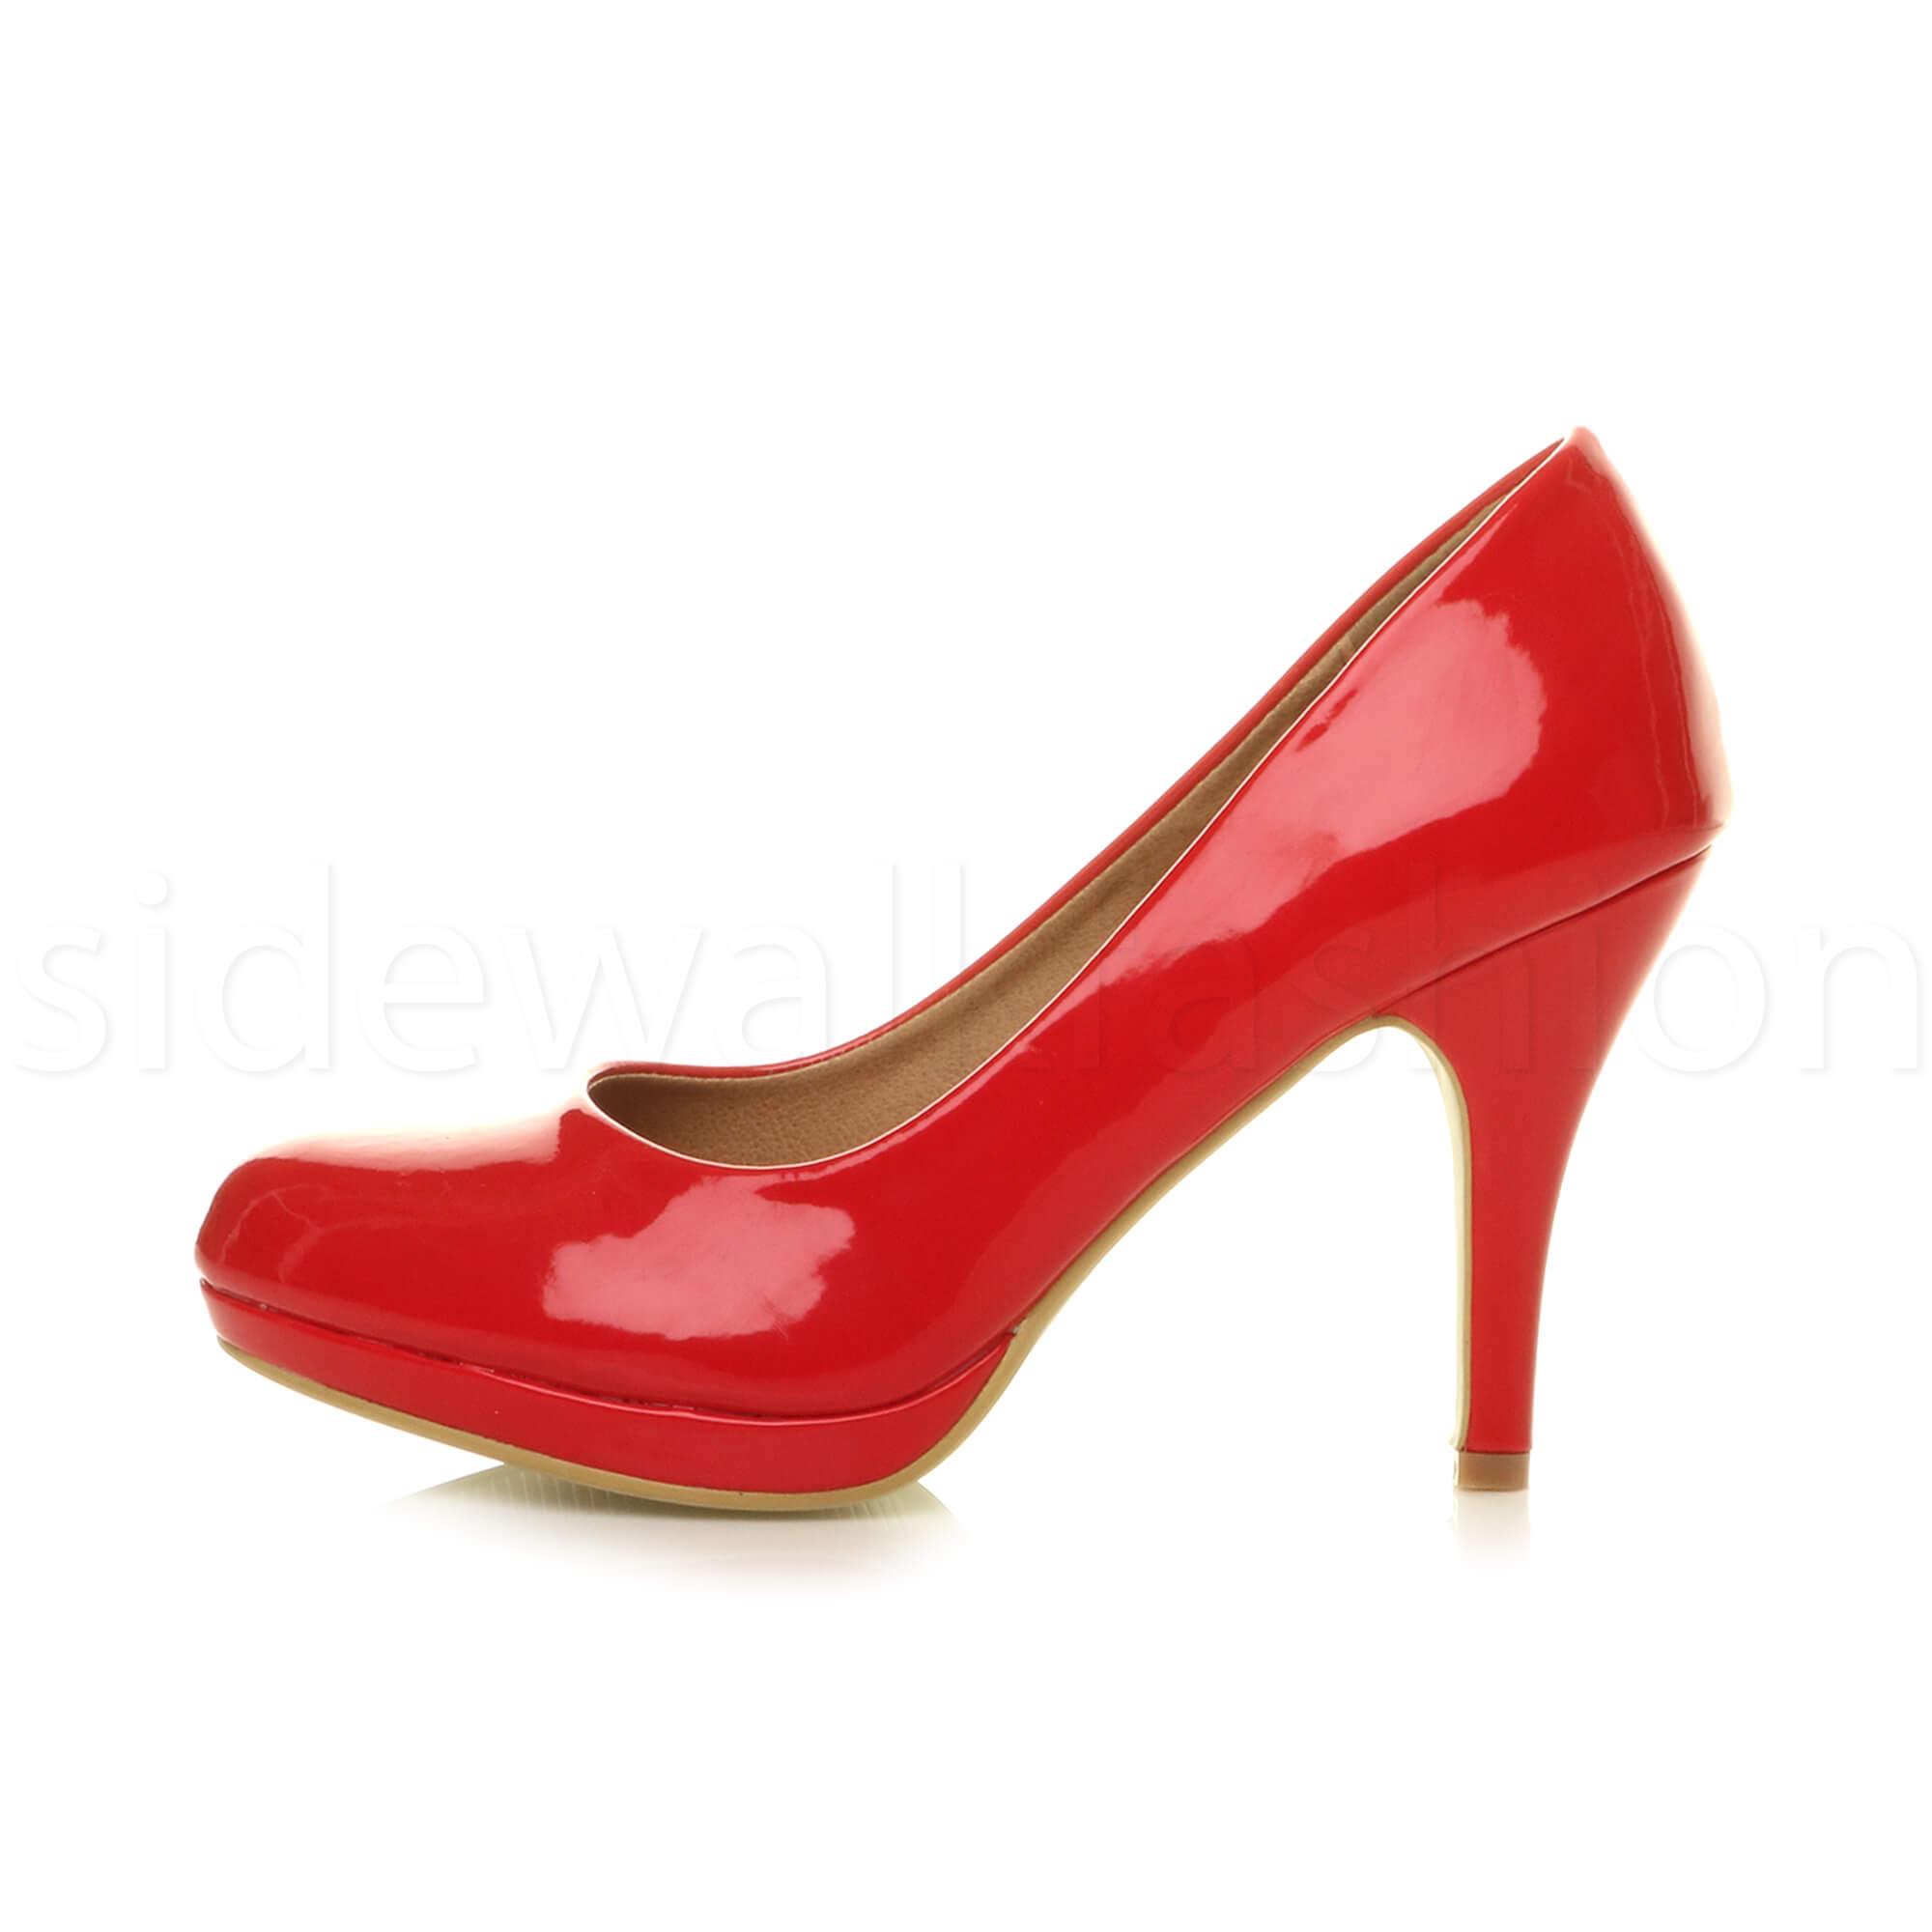 Womens-ladies-high-mid-heel-platform-wedding-evening-bridesmaid-court-shoes-size thumbnail 143